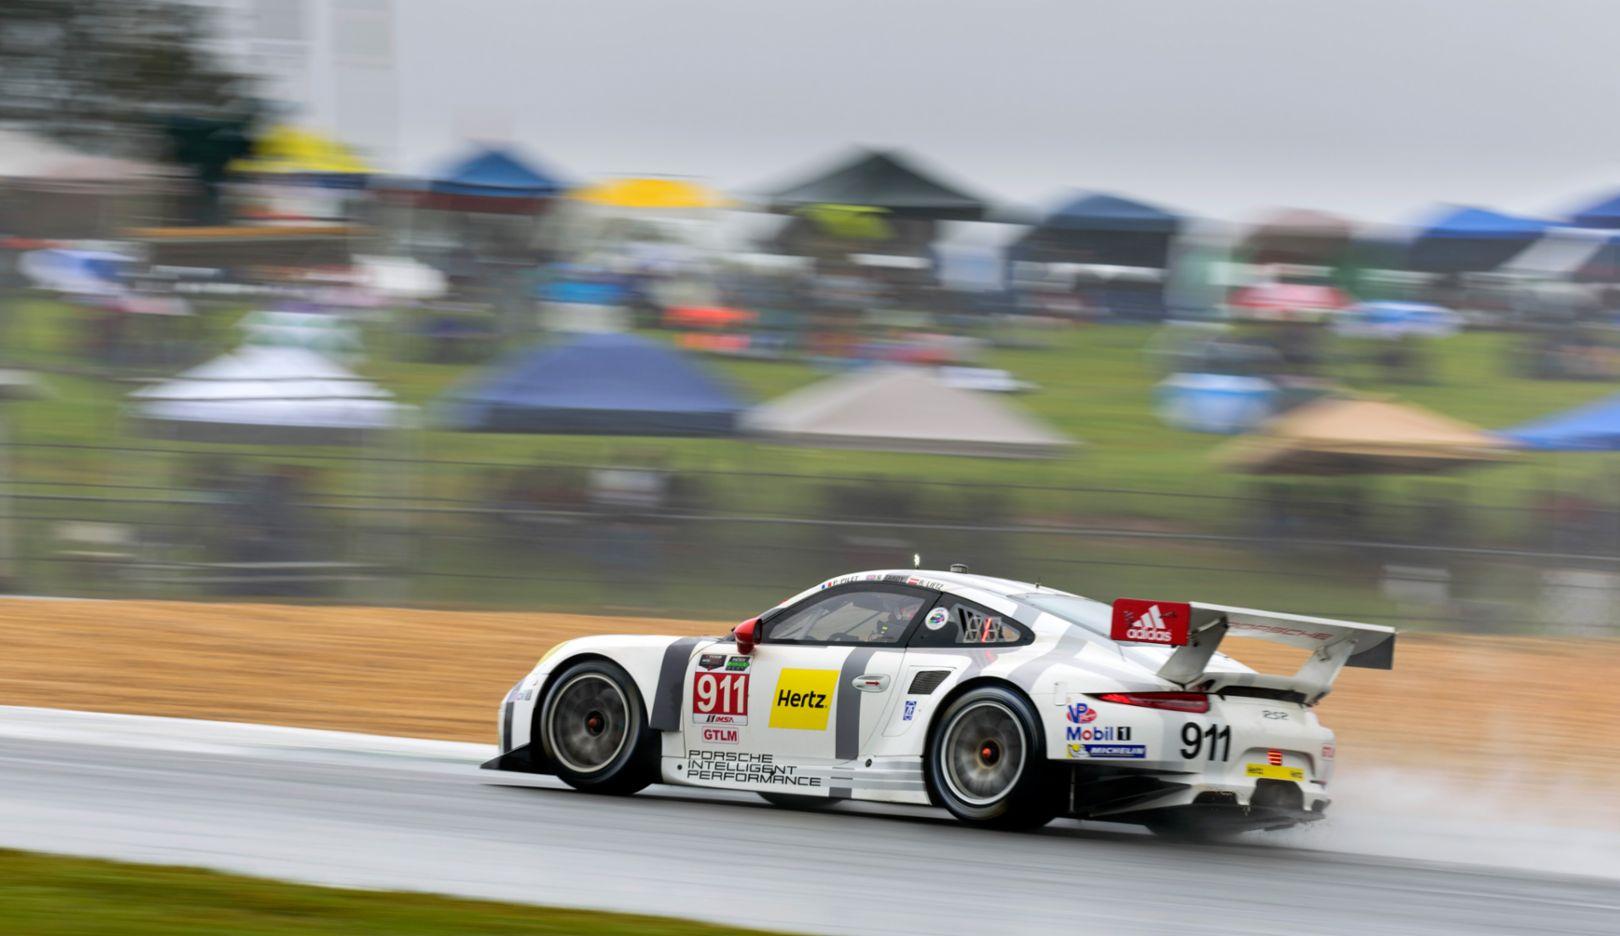 Porsche 911 RSR, United SportsCar Championship, Braselton/USA 2015, Porsche AG